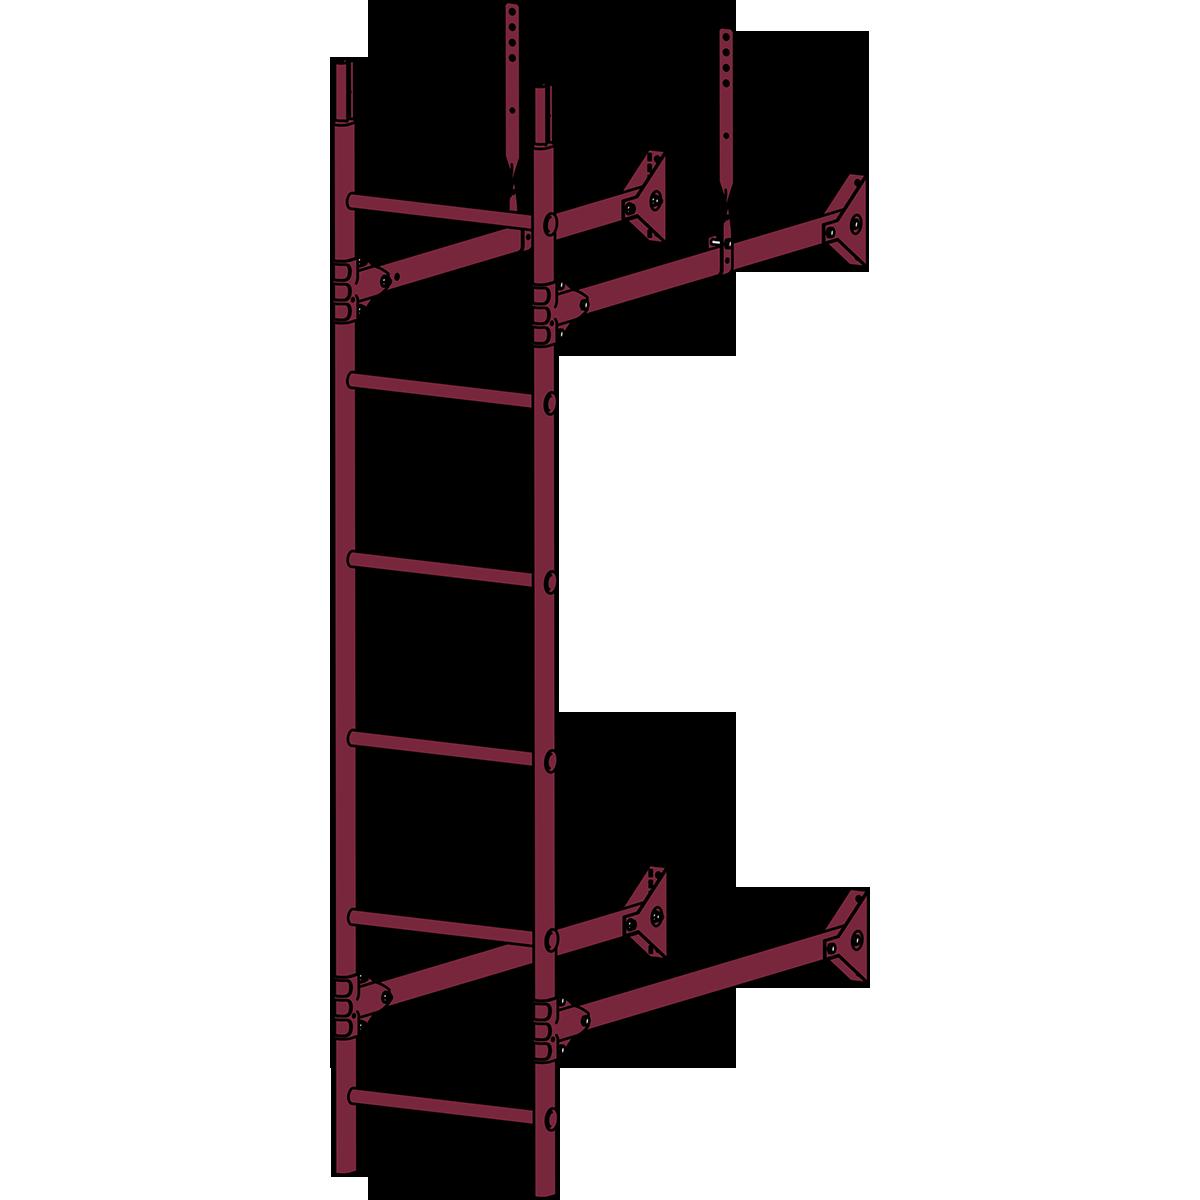 Лестница стеновая ROOFSYSTEMS PRESTIGE ZN 3м RAL 3005 Красное вино